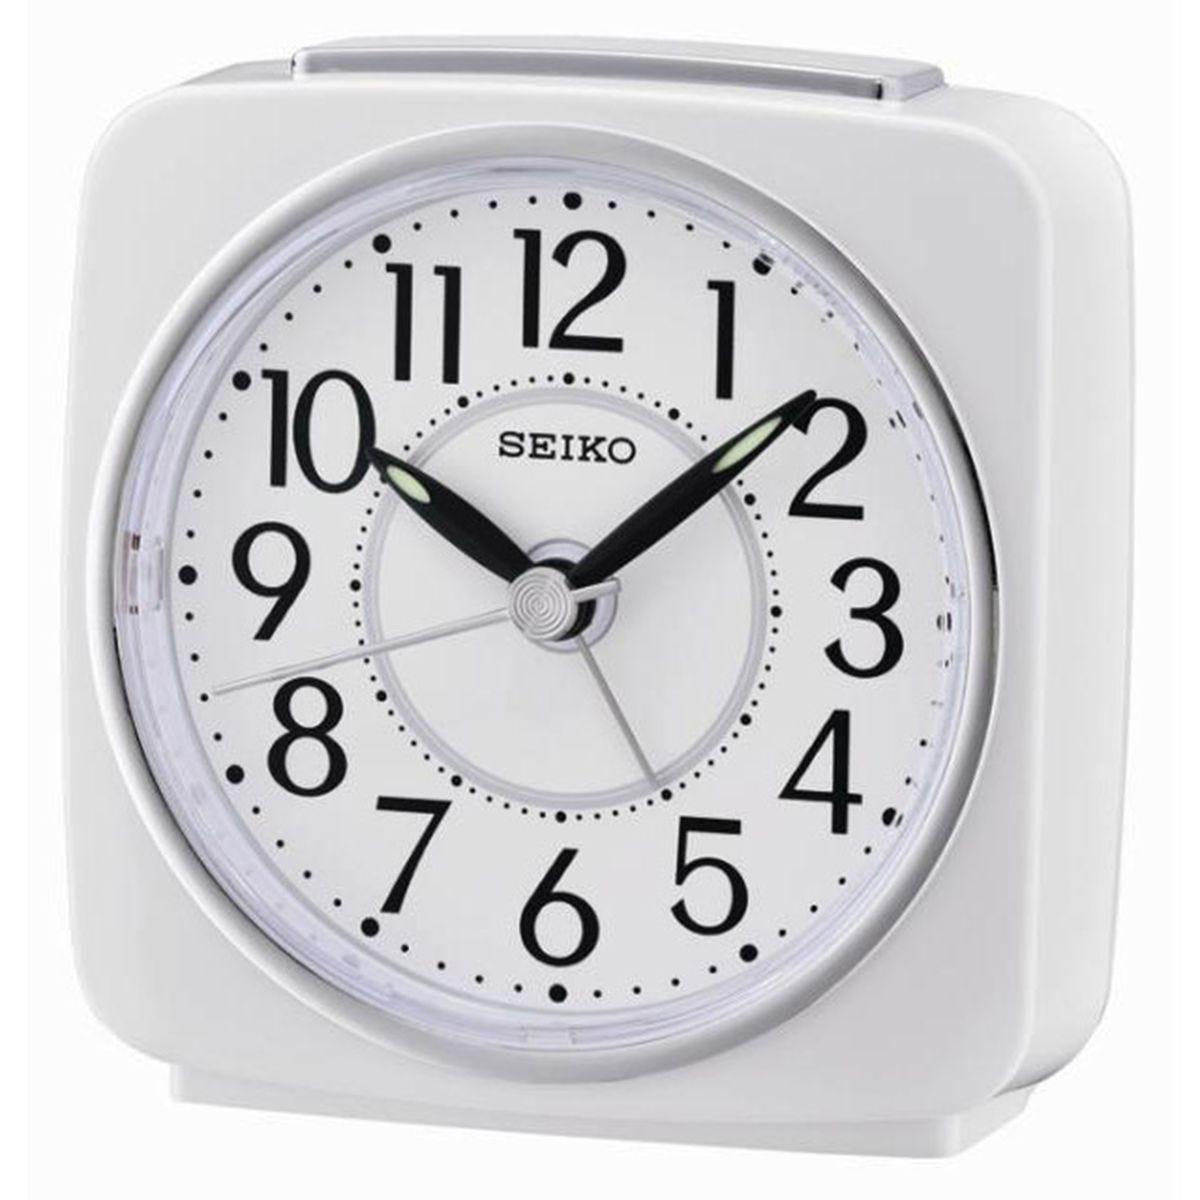 Seiko Square Beep Alarm Clock with Snooze - White